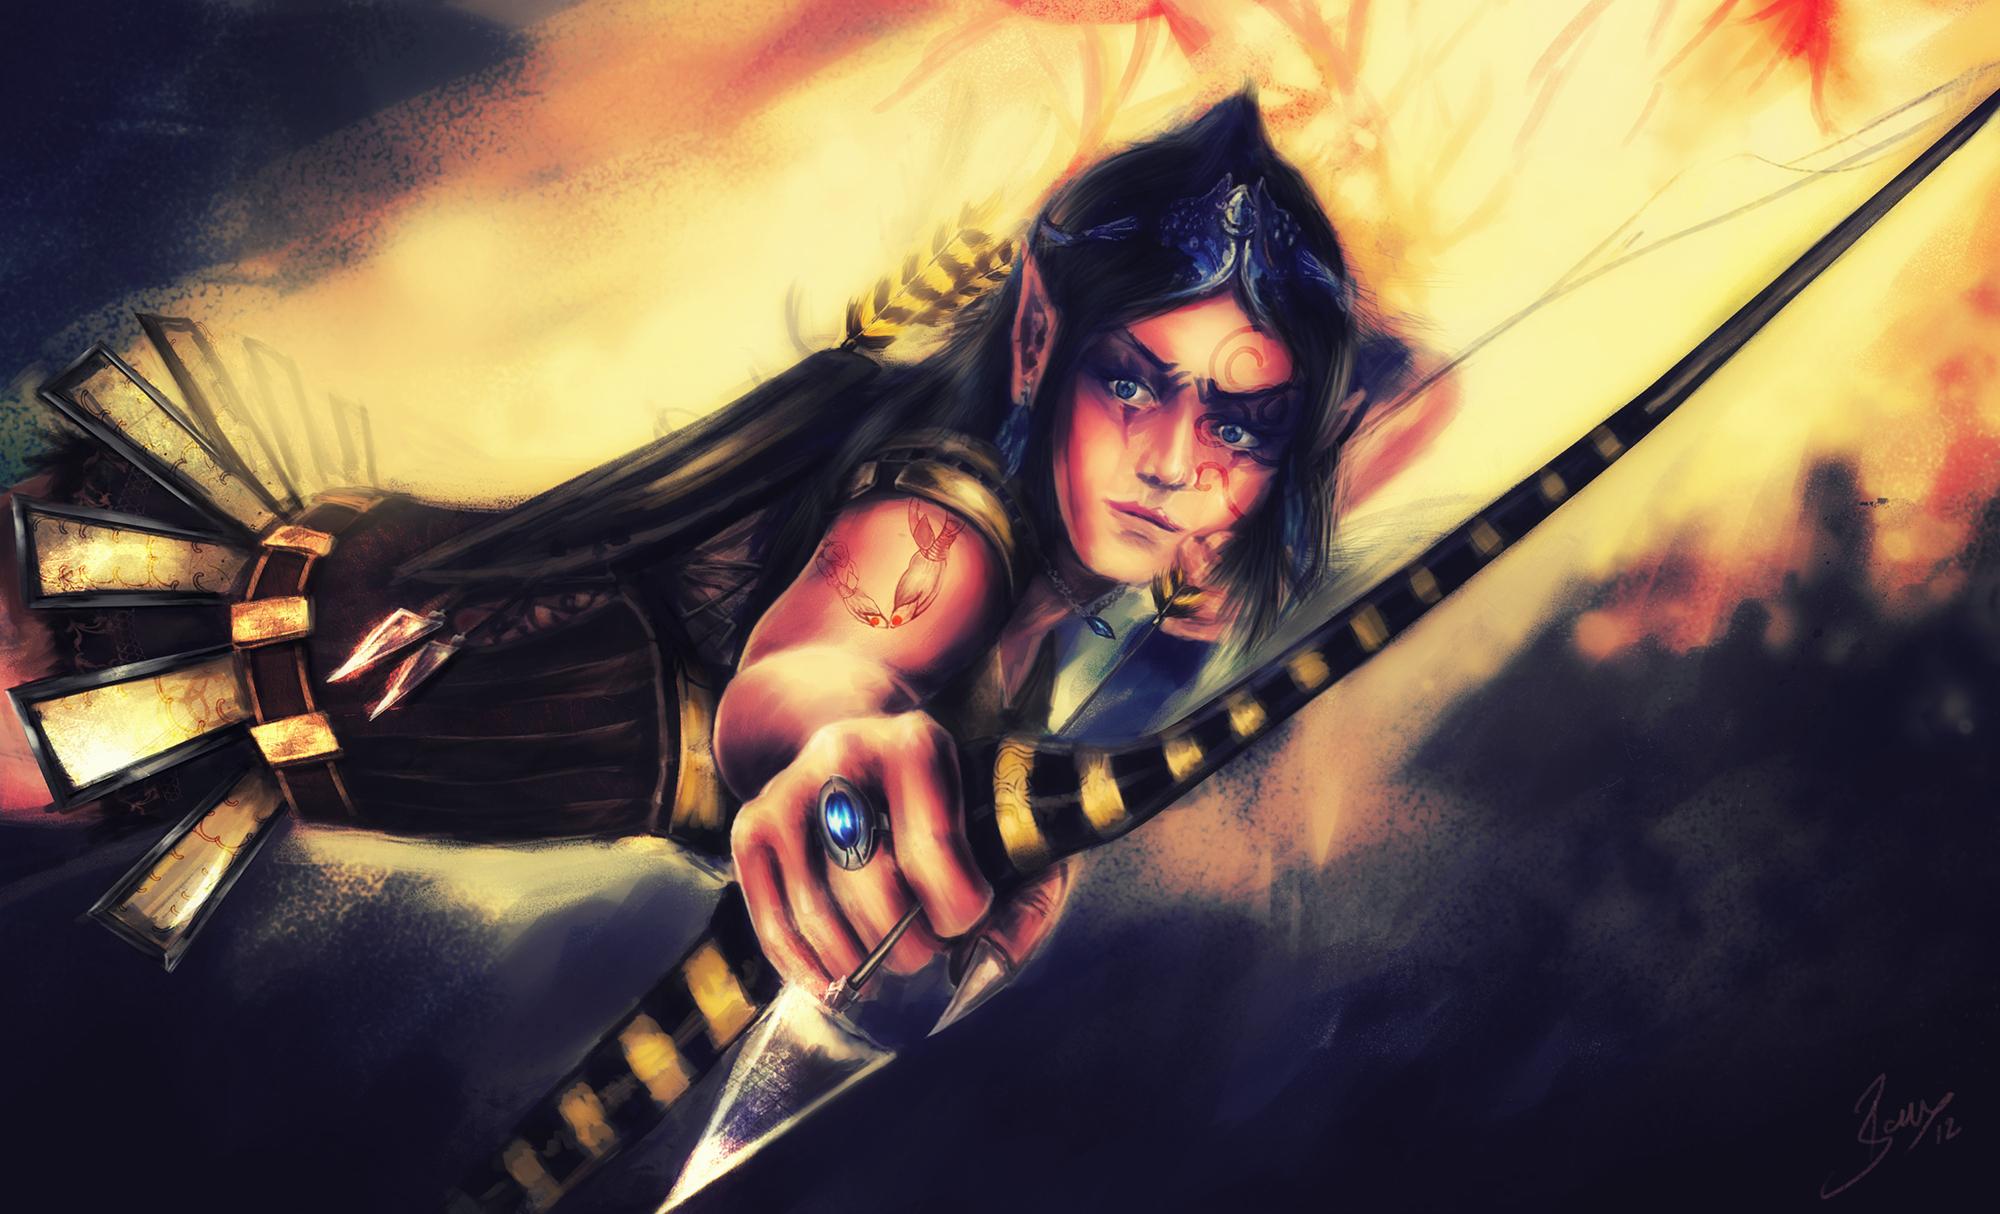 Archer Warrior Elves Fantasy Art Wallpapers Hd: Elves Warrior Archer Painting Art Fantasy Girl Wallpaper